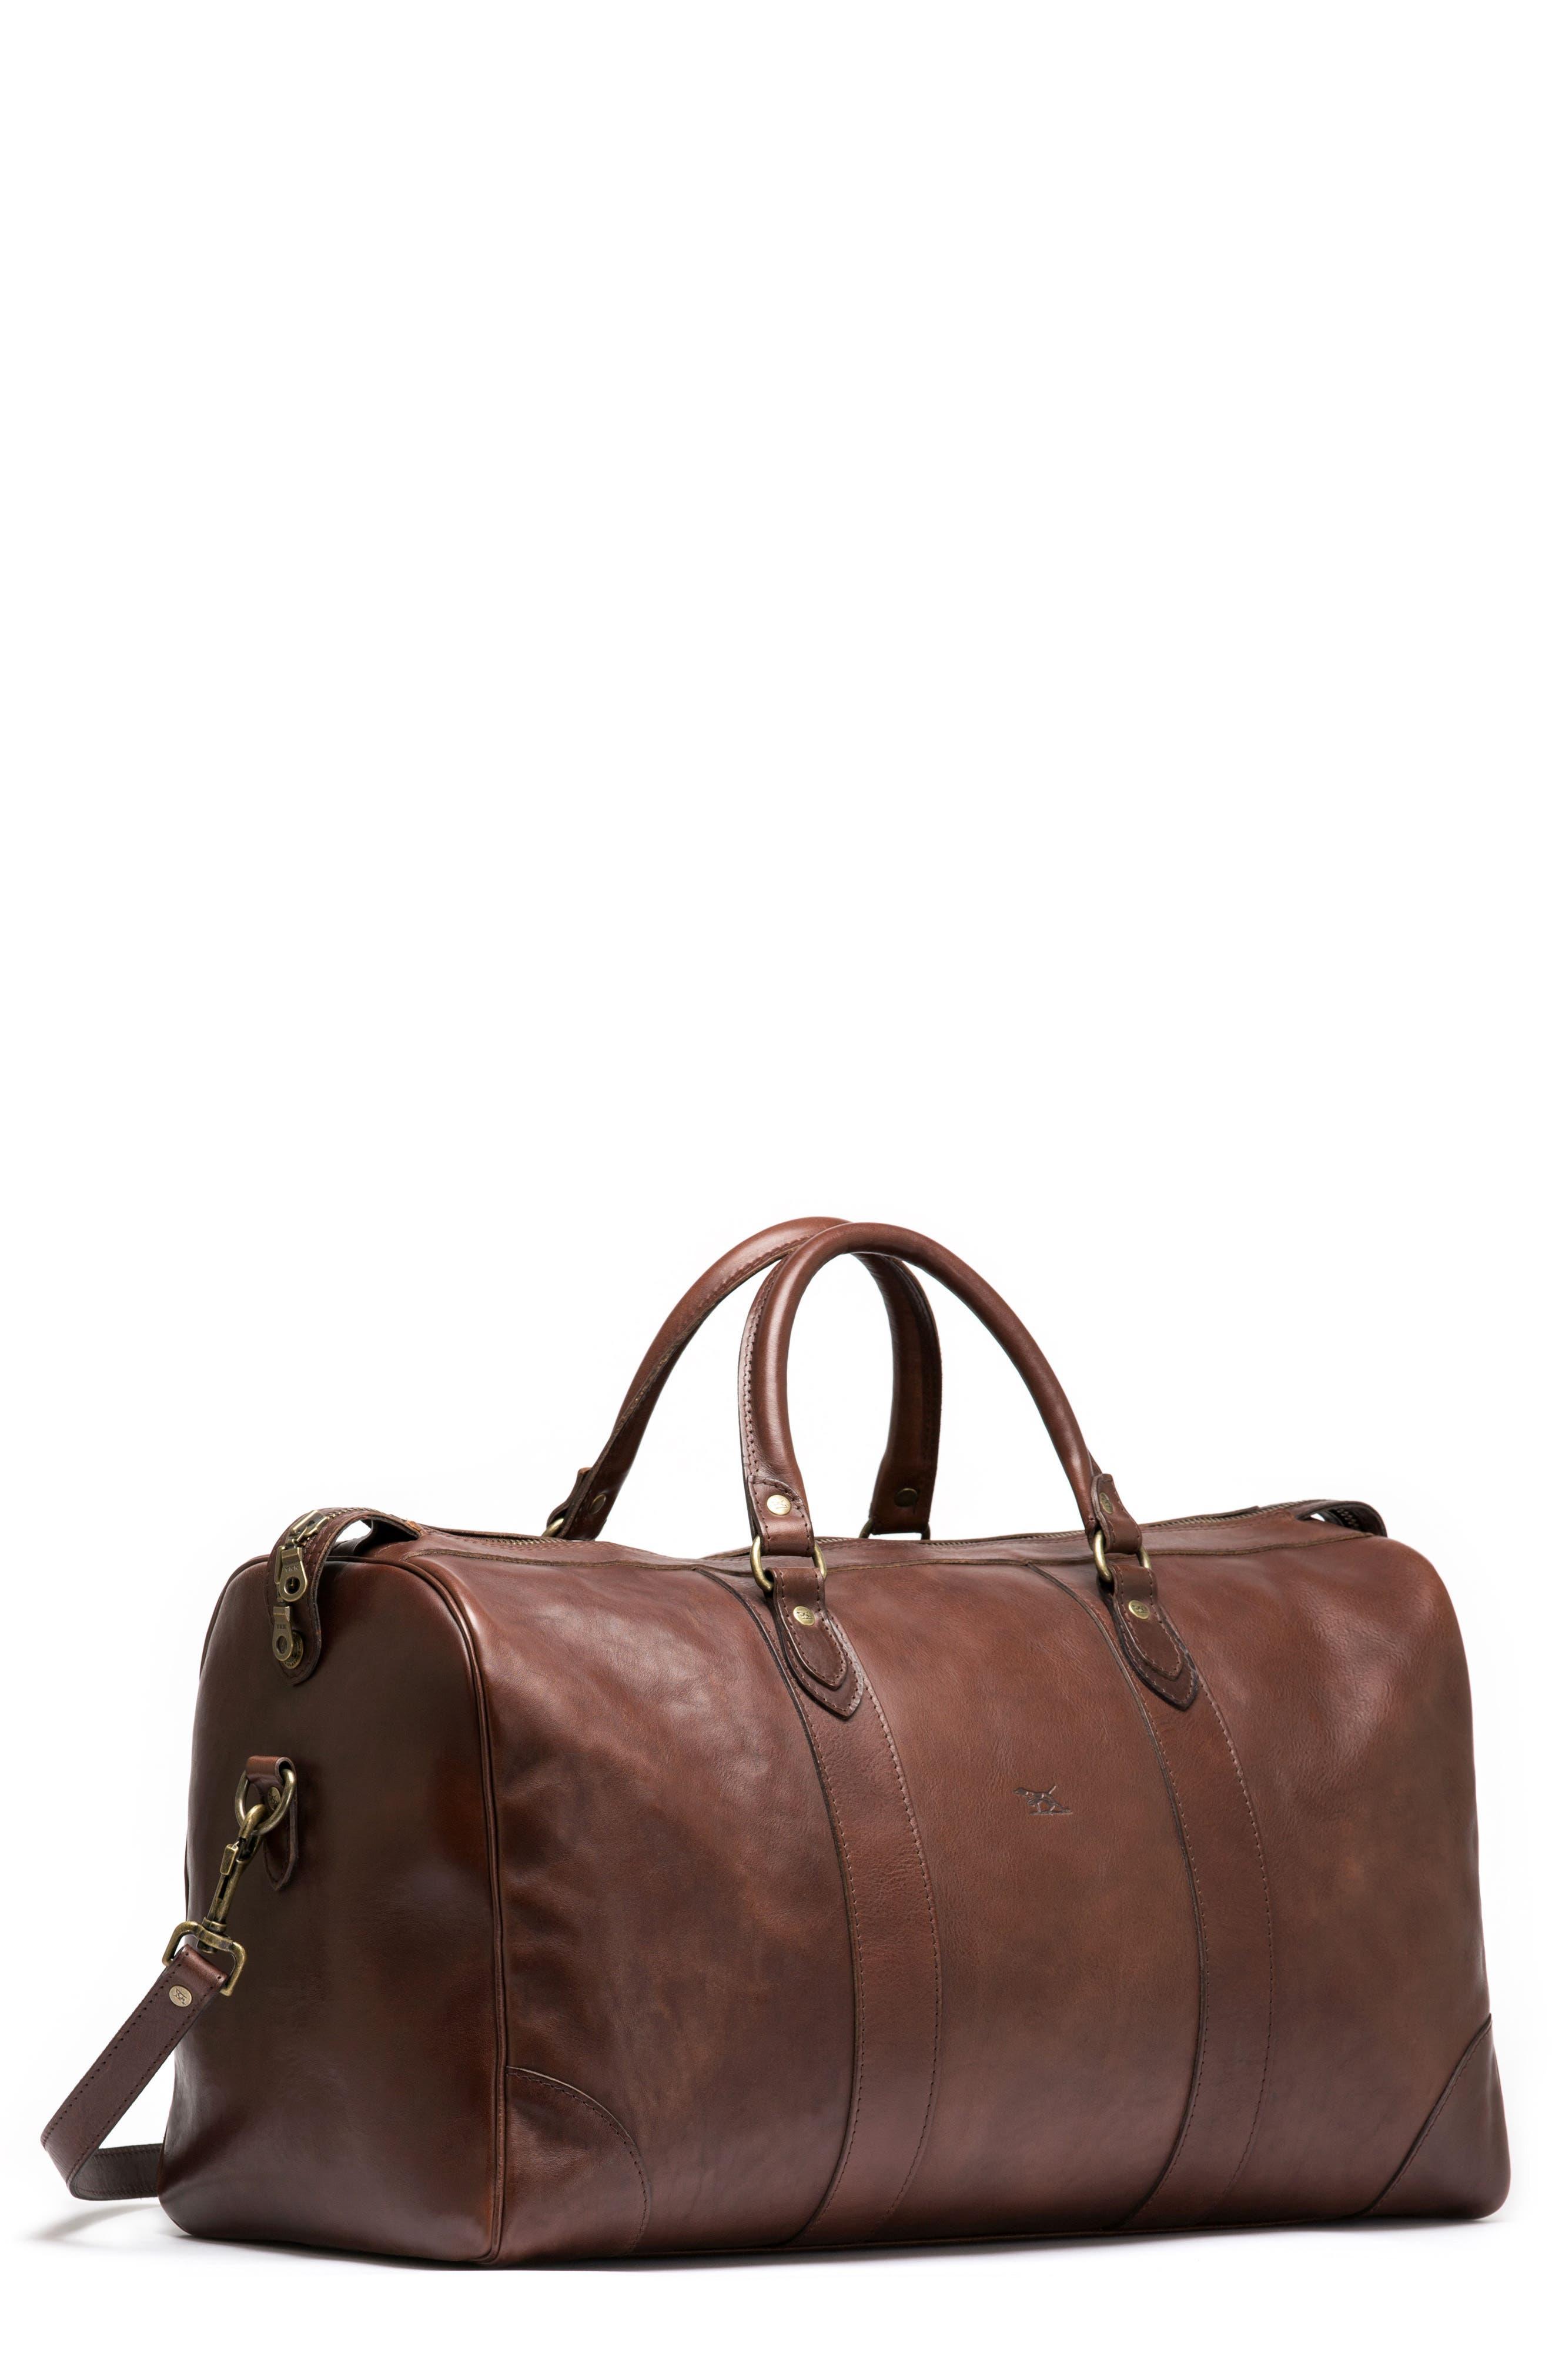 RODD & GUNN Leather Duffel Bag, Main, color, 216